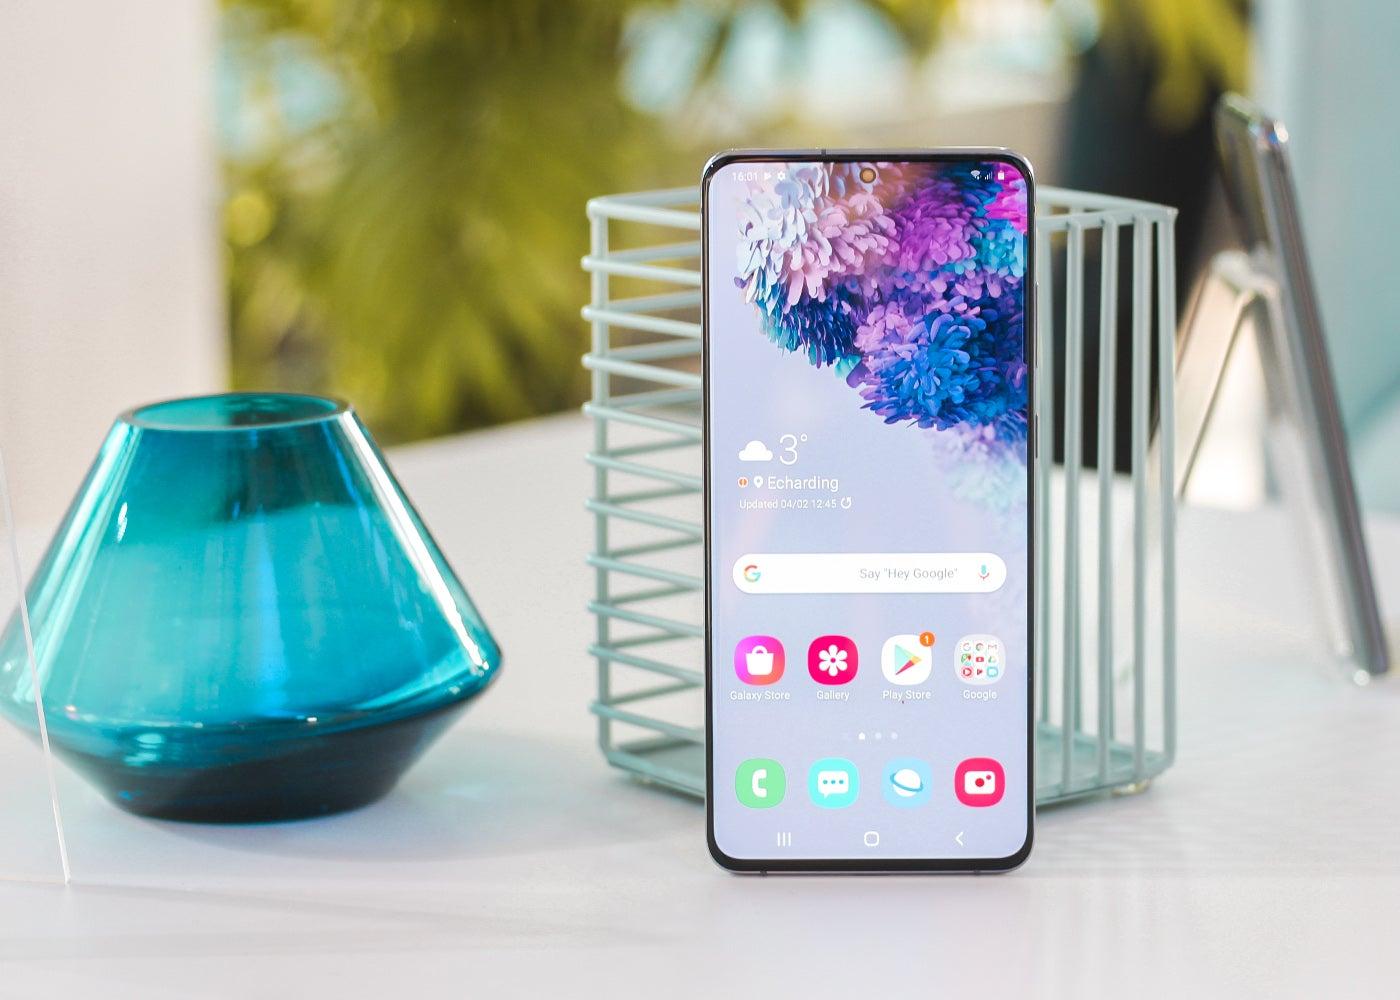 Samsung Galaxy S20 Ultra, screen